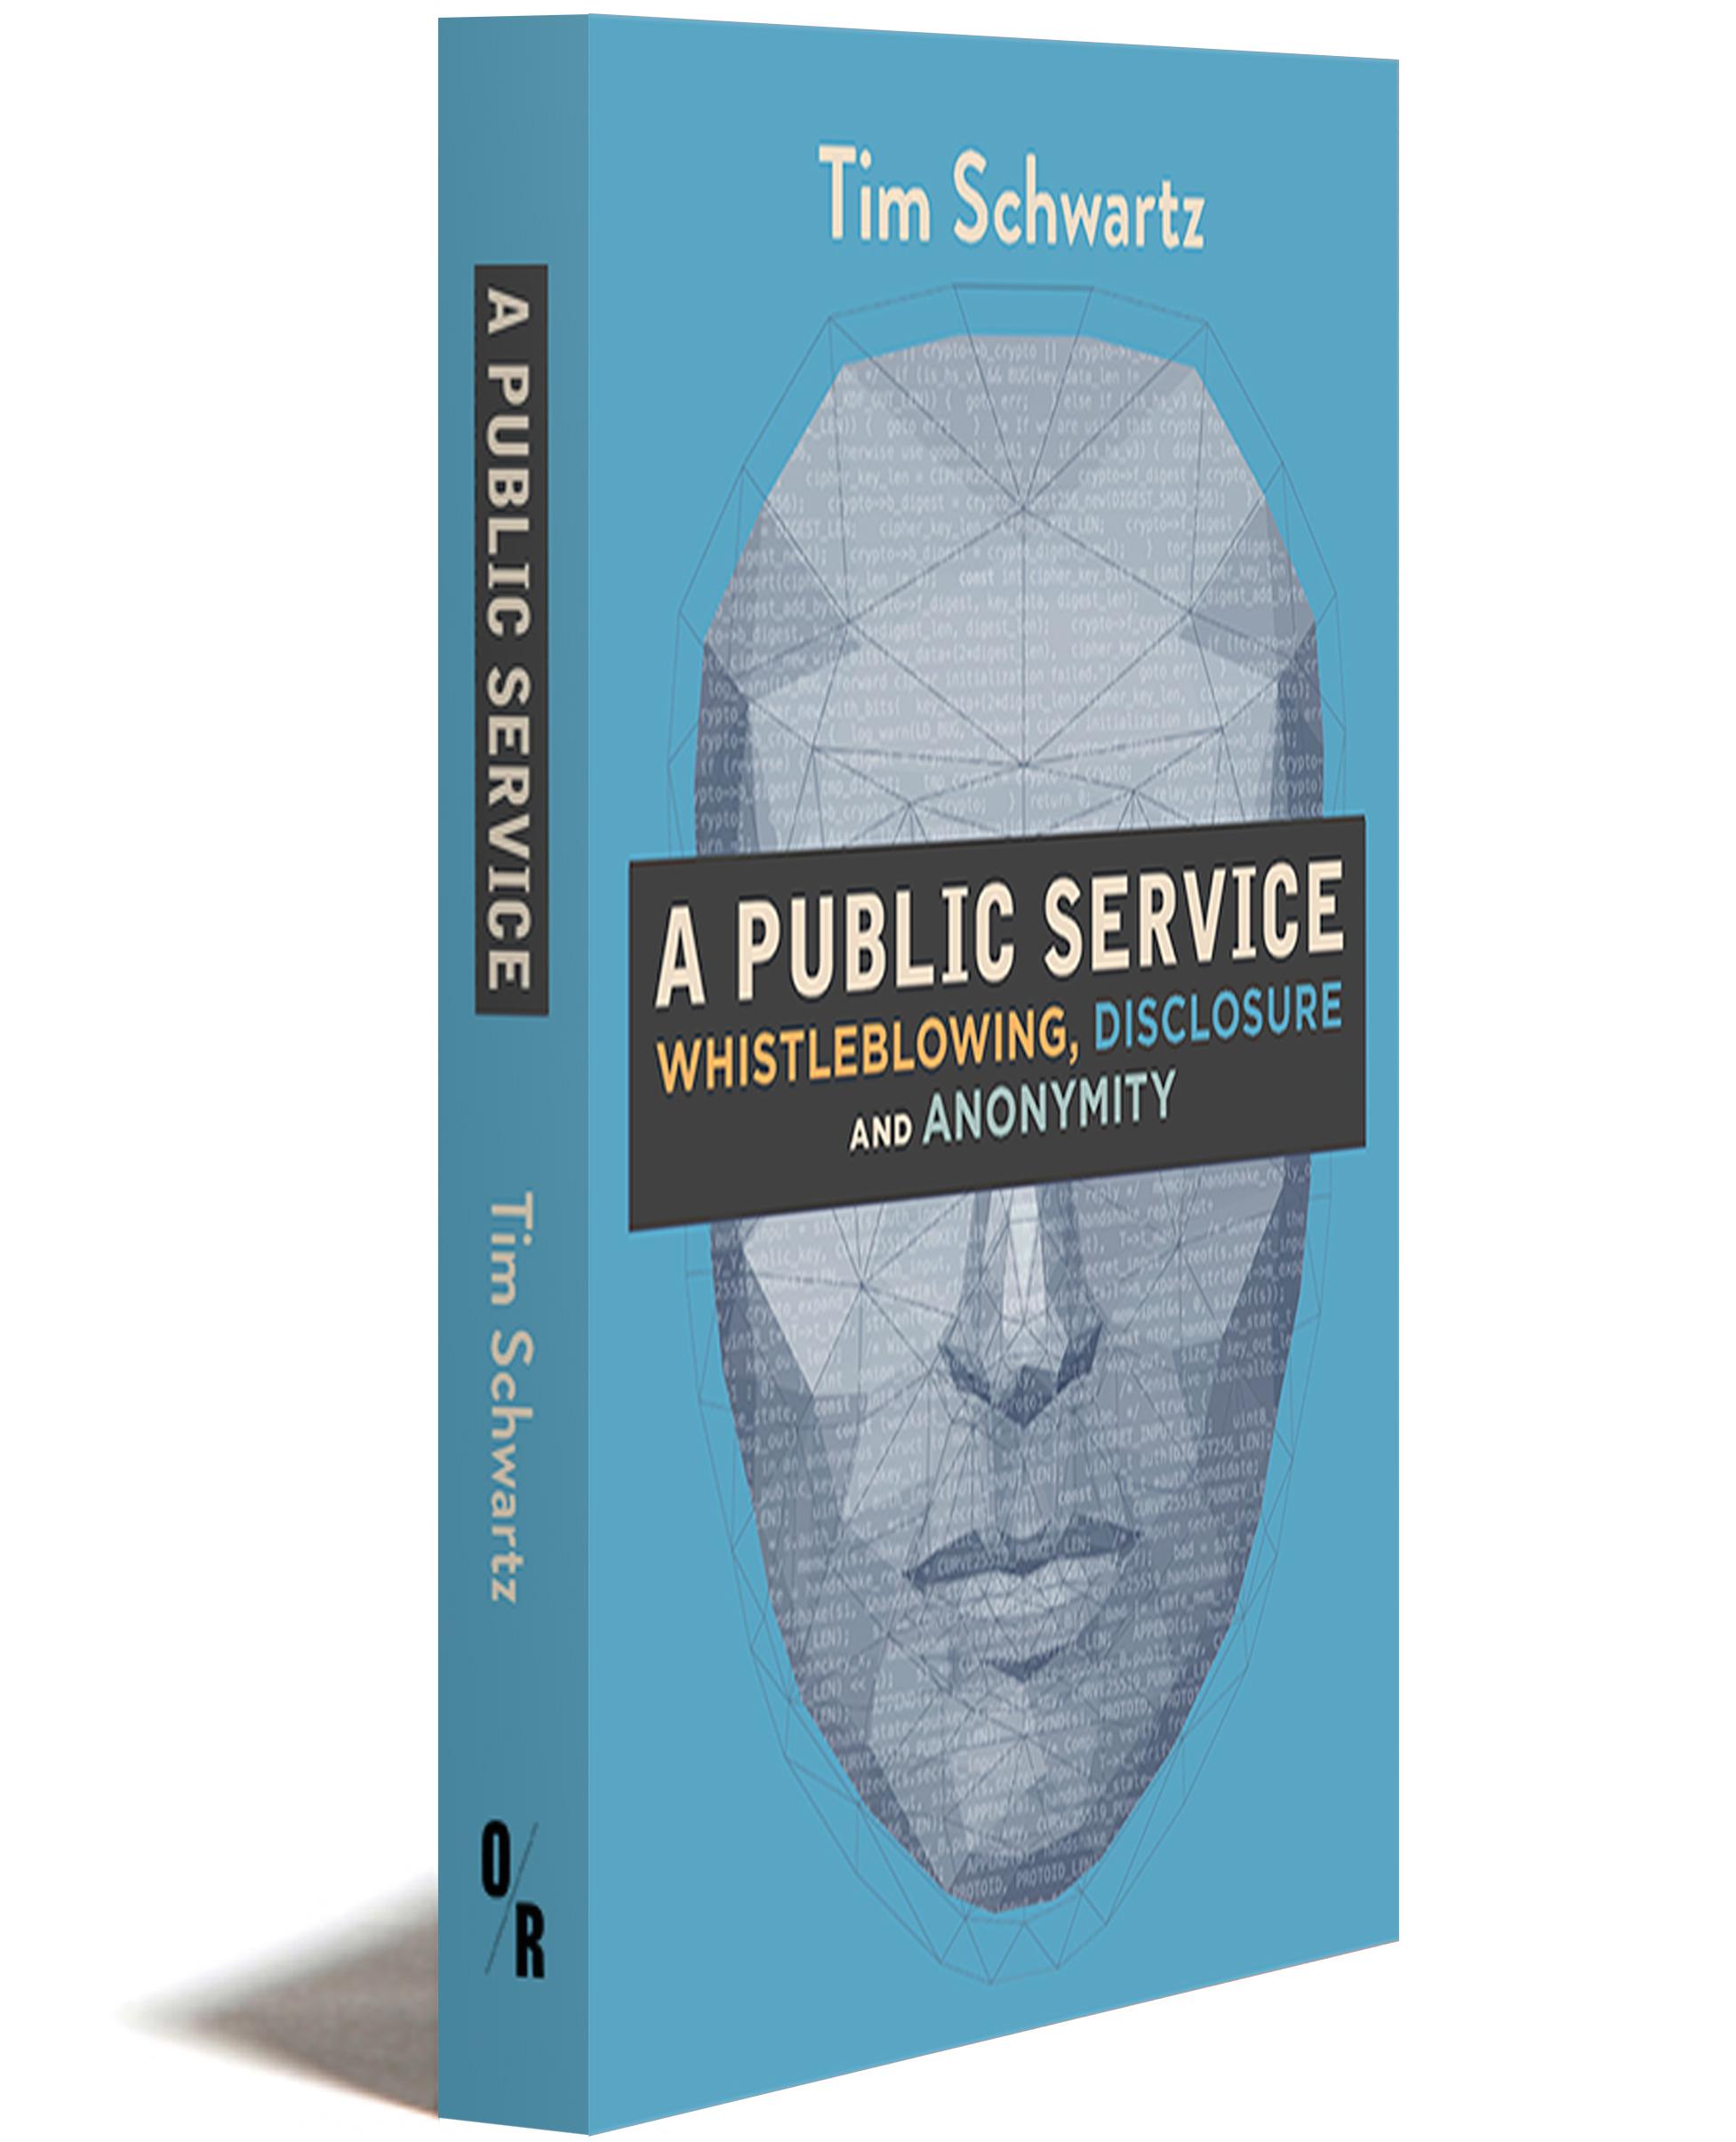 a publice service cover